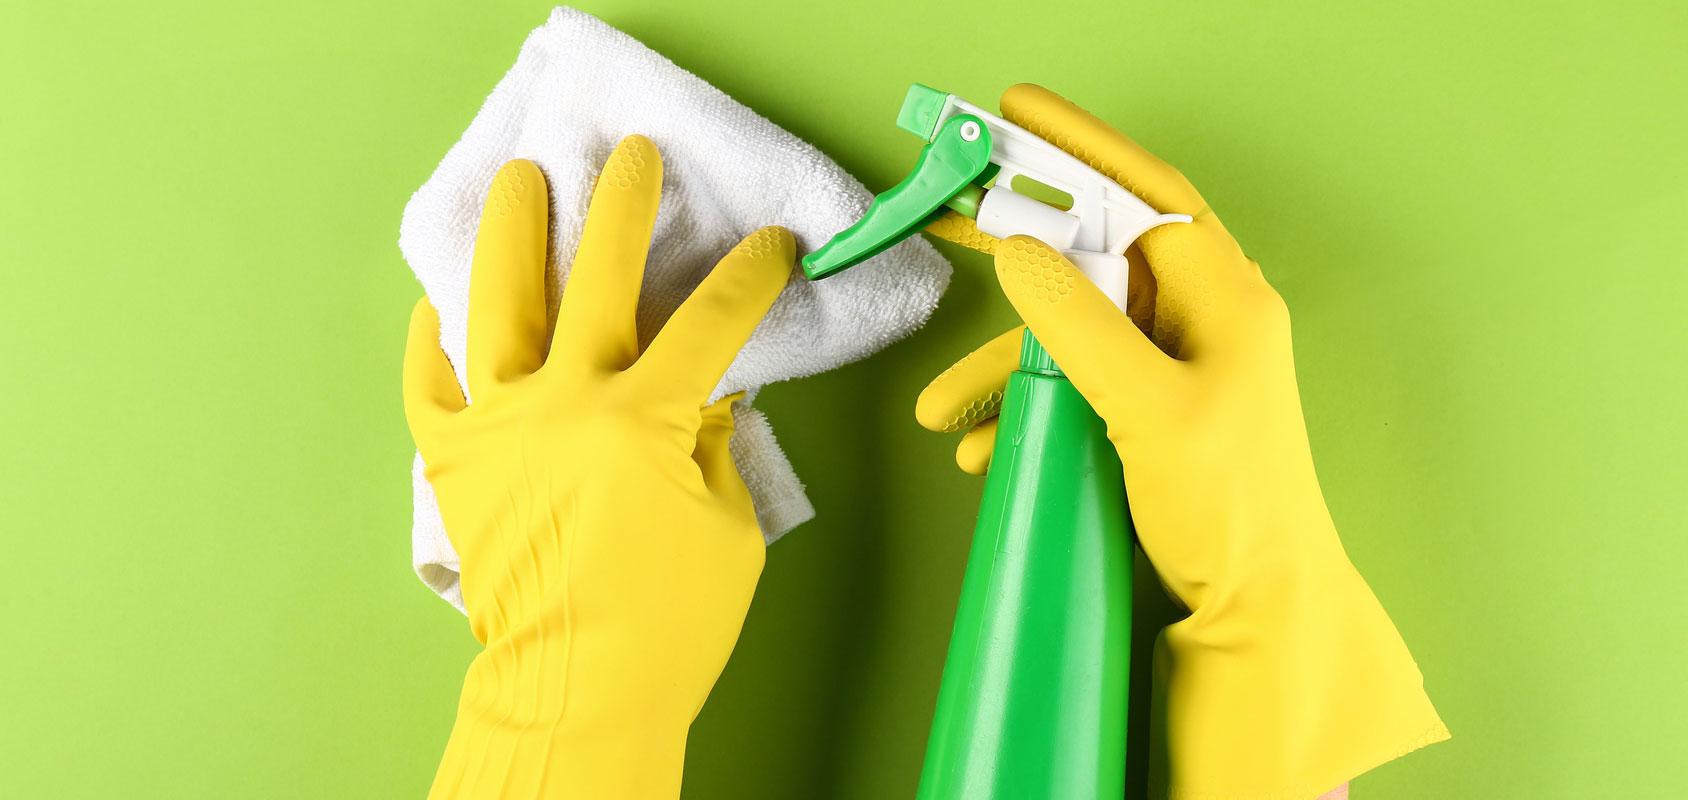 gloves cleaning bottle